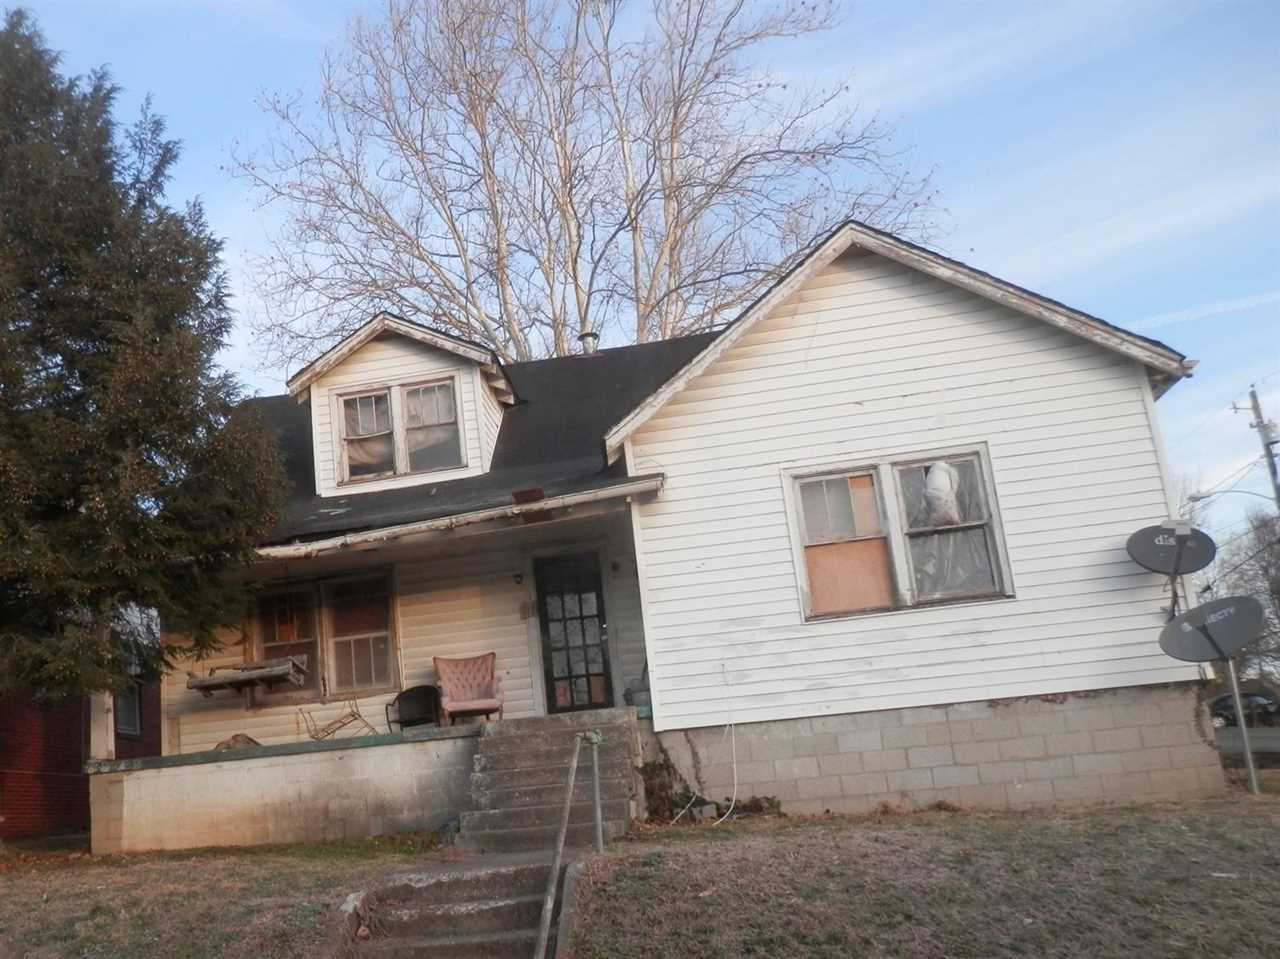 411 E High Street Mt Sterling, KY 40353 | MLS 1801567 Photo 1